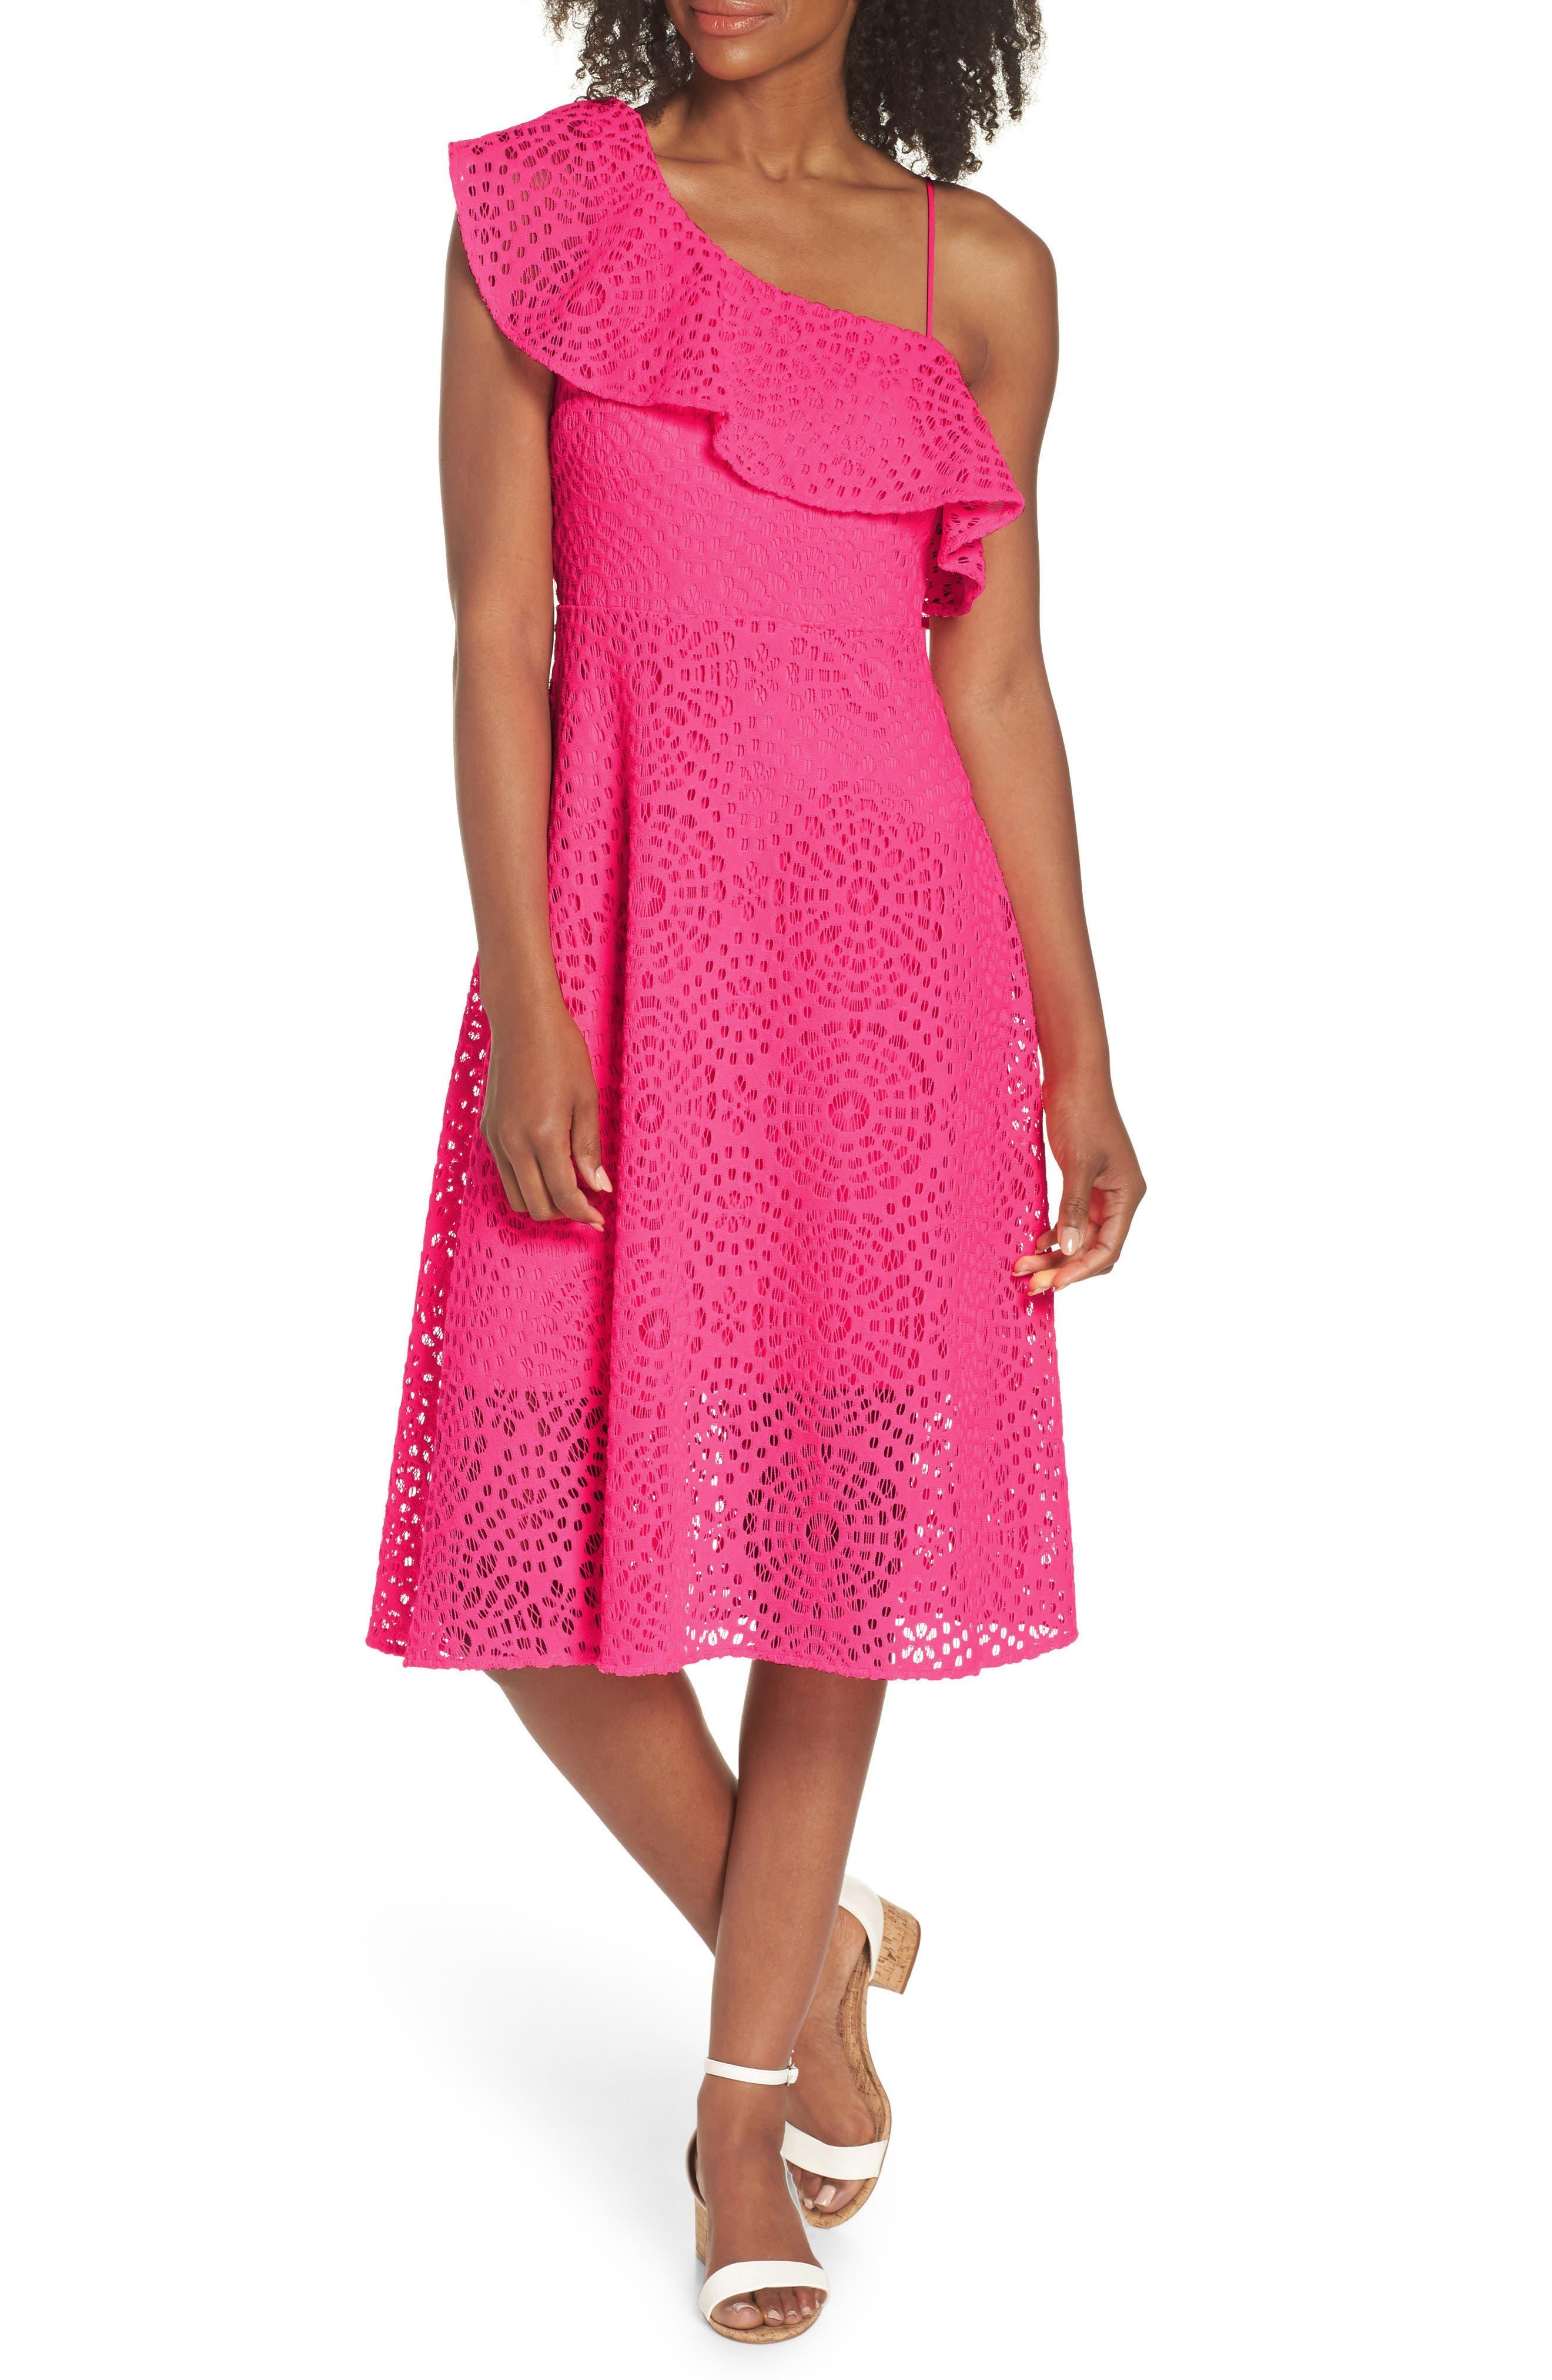 Callisto Ruffle One-Shoulder Midi Dress,                         Main,                         color, PINK SEA URCHIN TERRY LACE